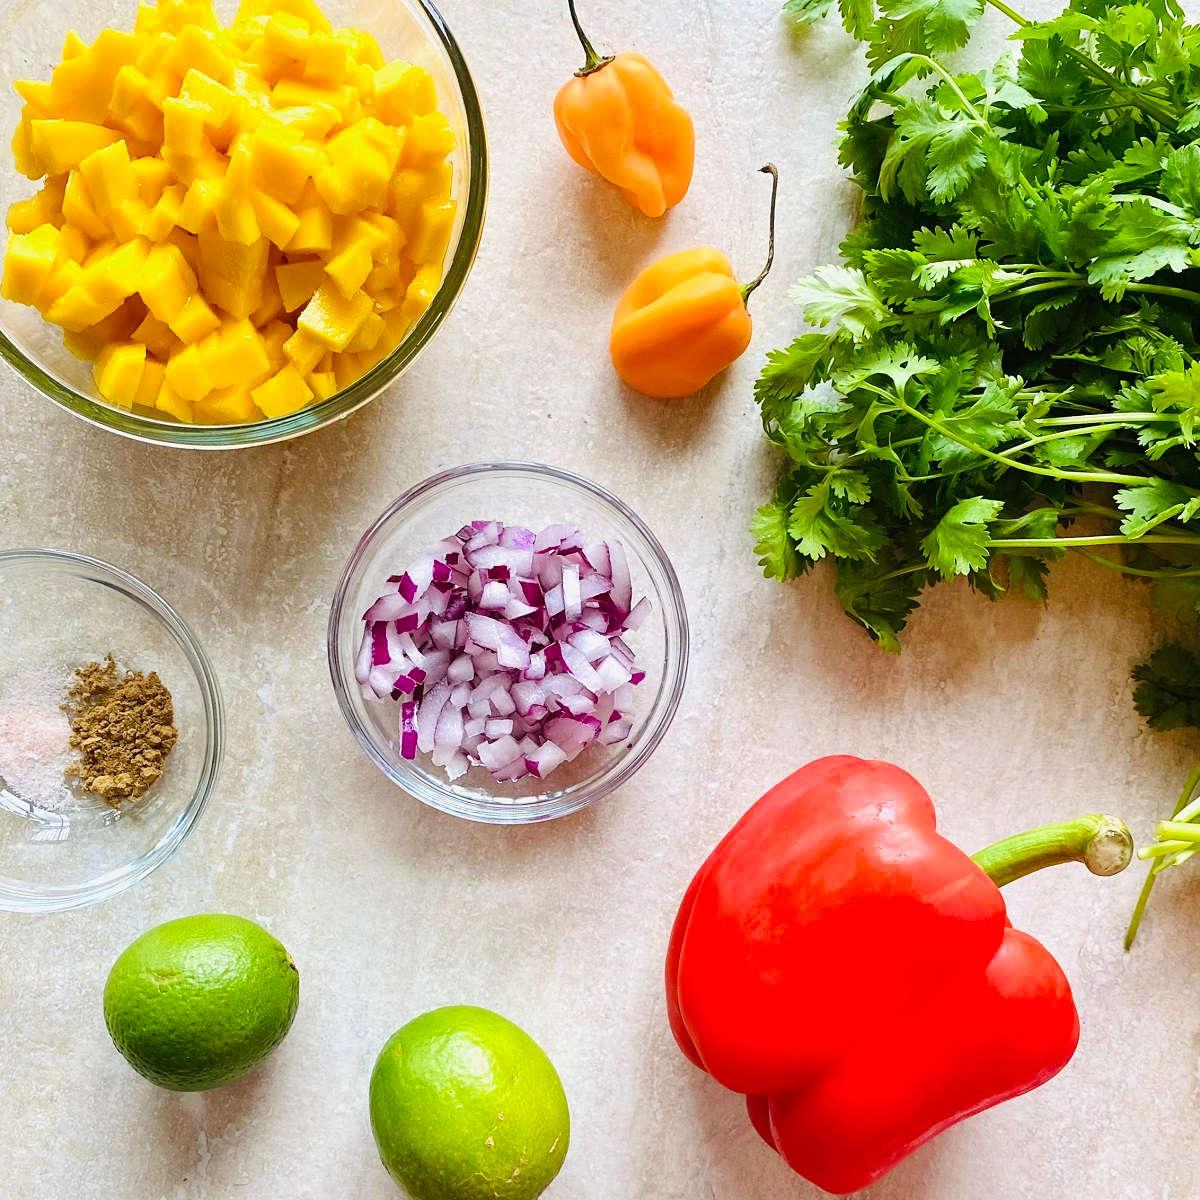 picture of ingredients to make habanero mango salsa